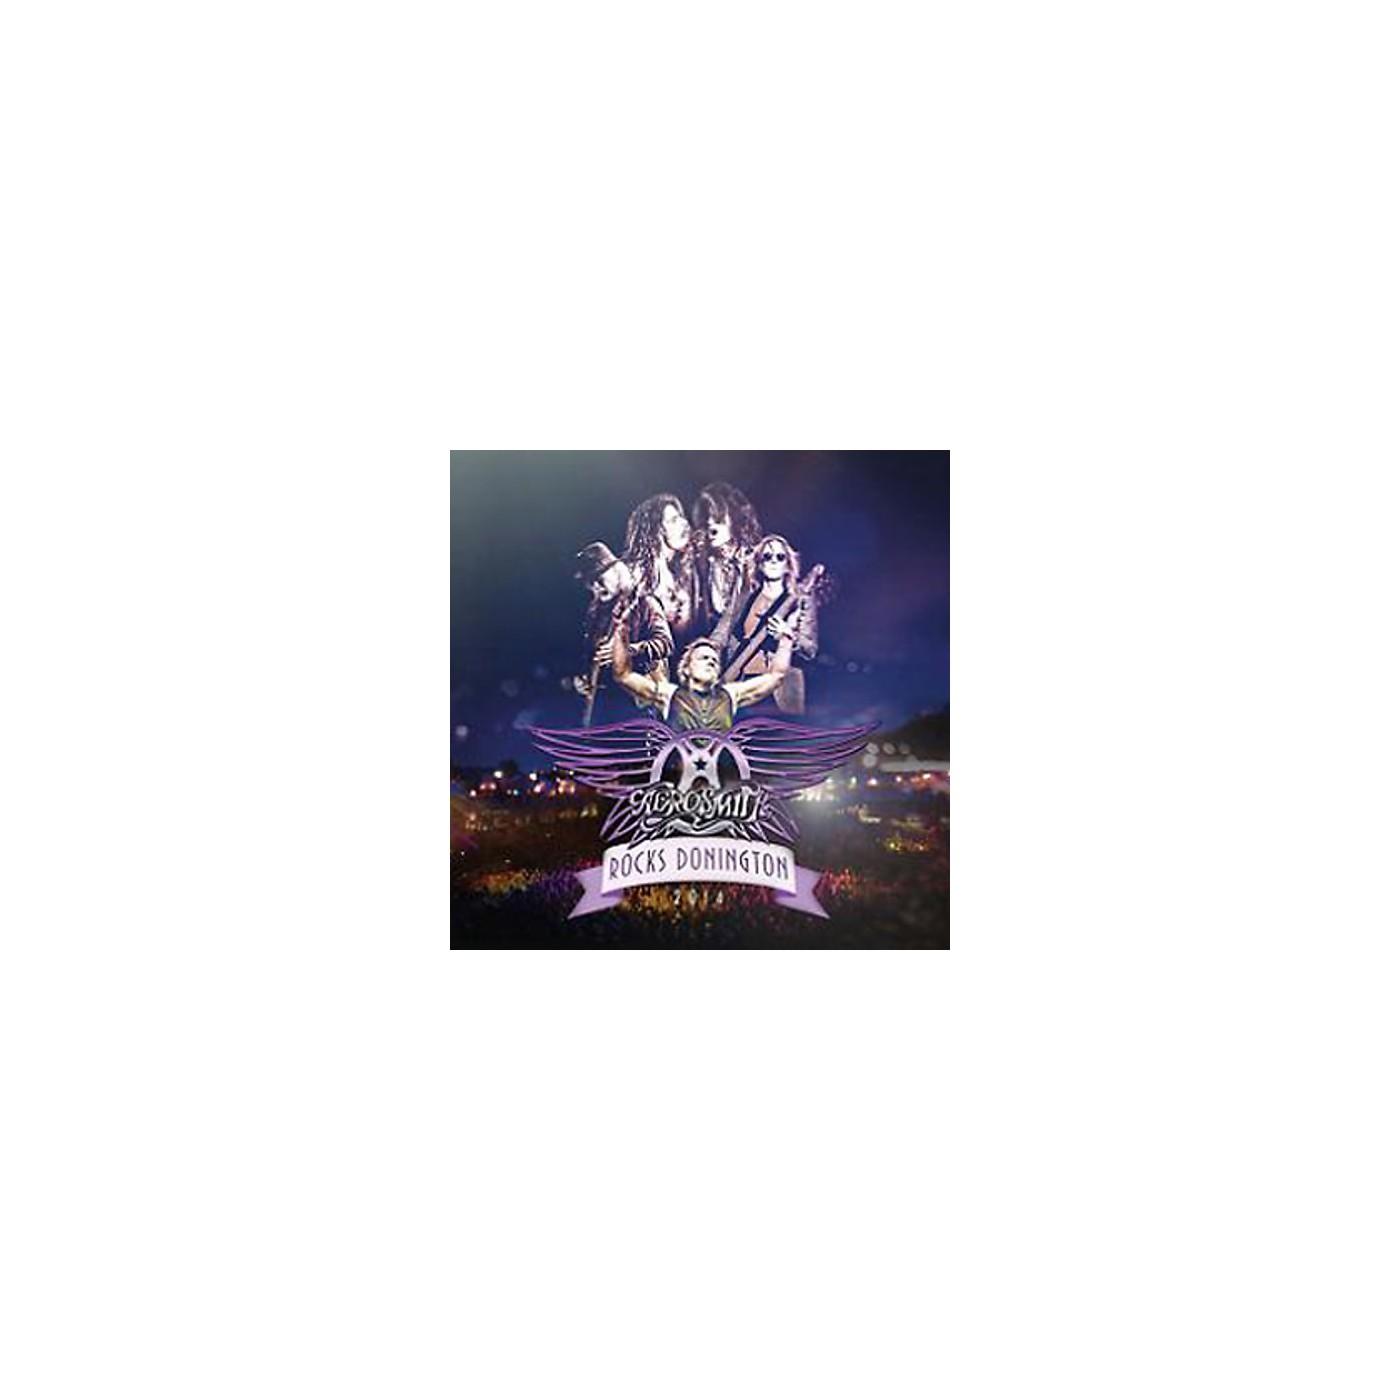 Alliance Aerosmith - Rocks Donington 2014 [3LP/DVD] [Limited Edition] thumbnail